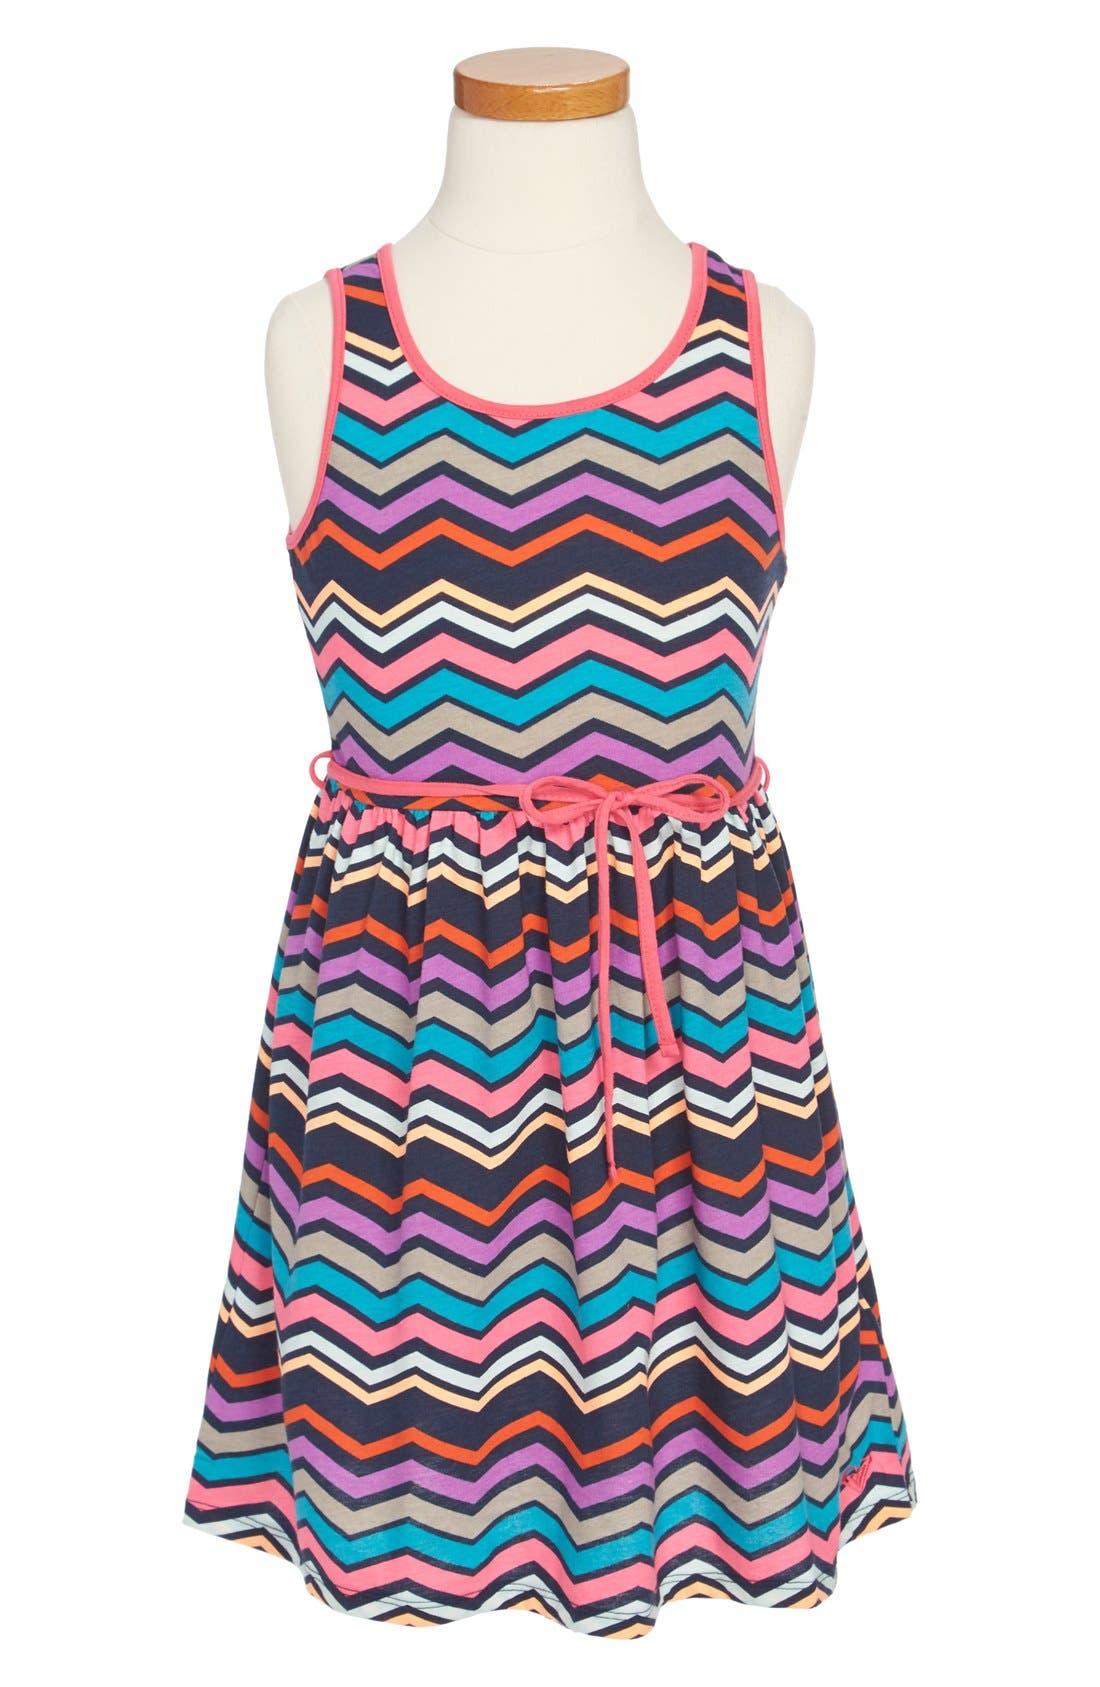 Alternate Image 1 Selected - Roxy 'Sweltering Heart' Tank Dress (Toddler Girls)